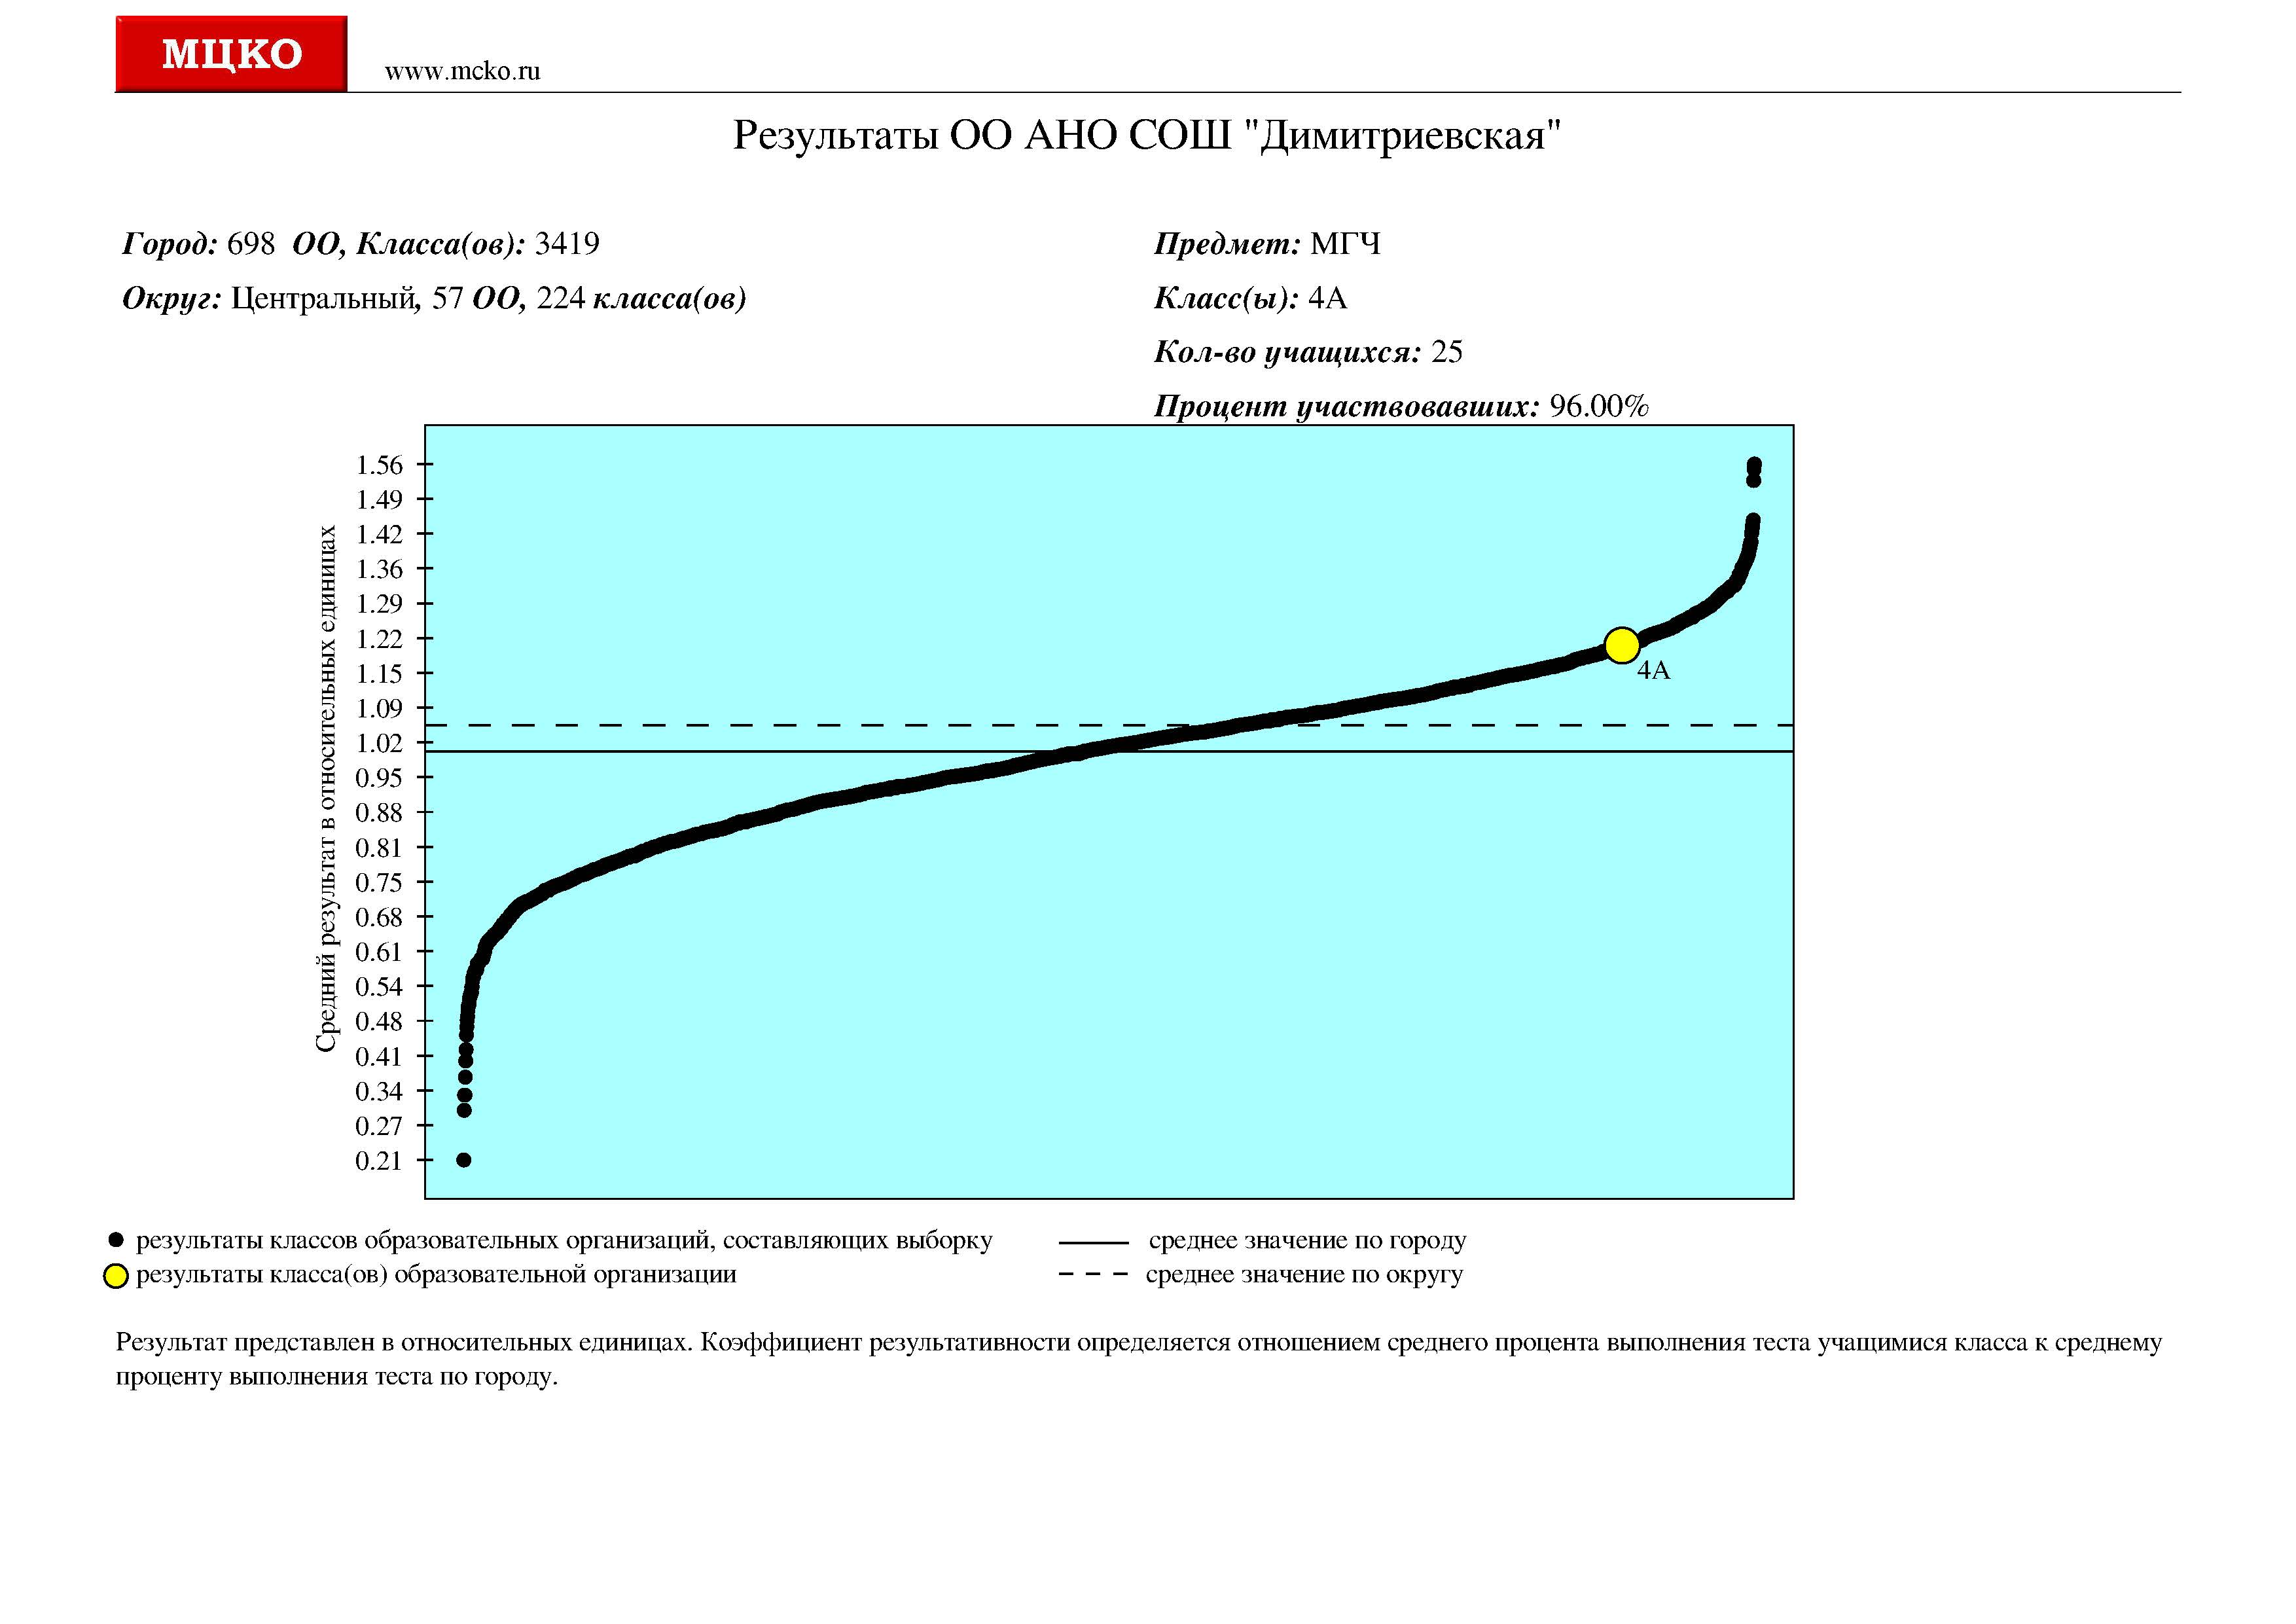 МЦКО 4 класс результат graph_9041 (17)